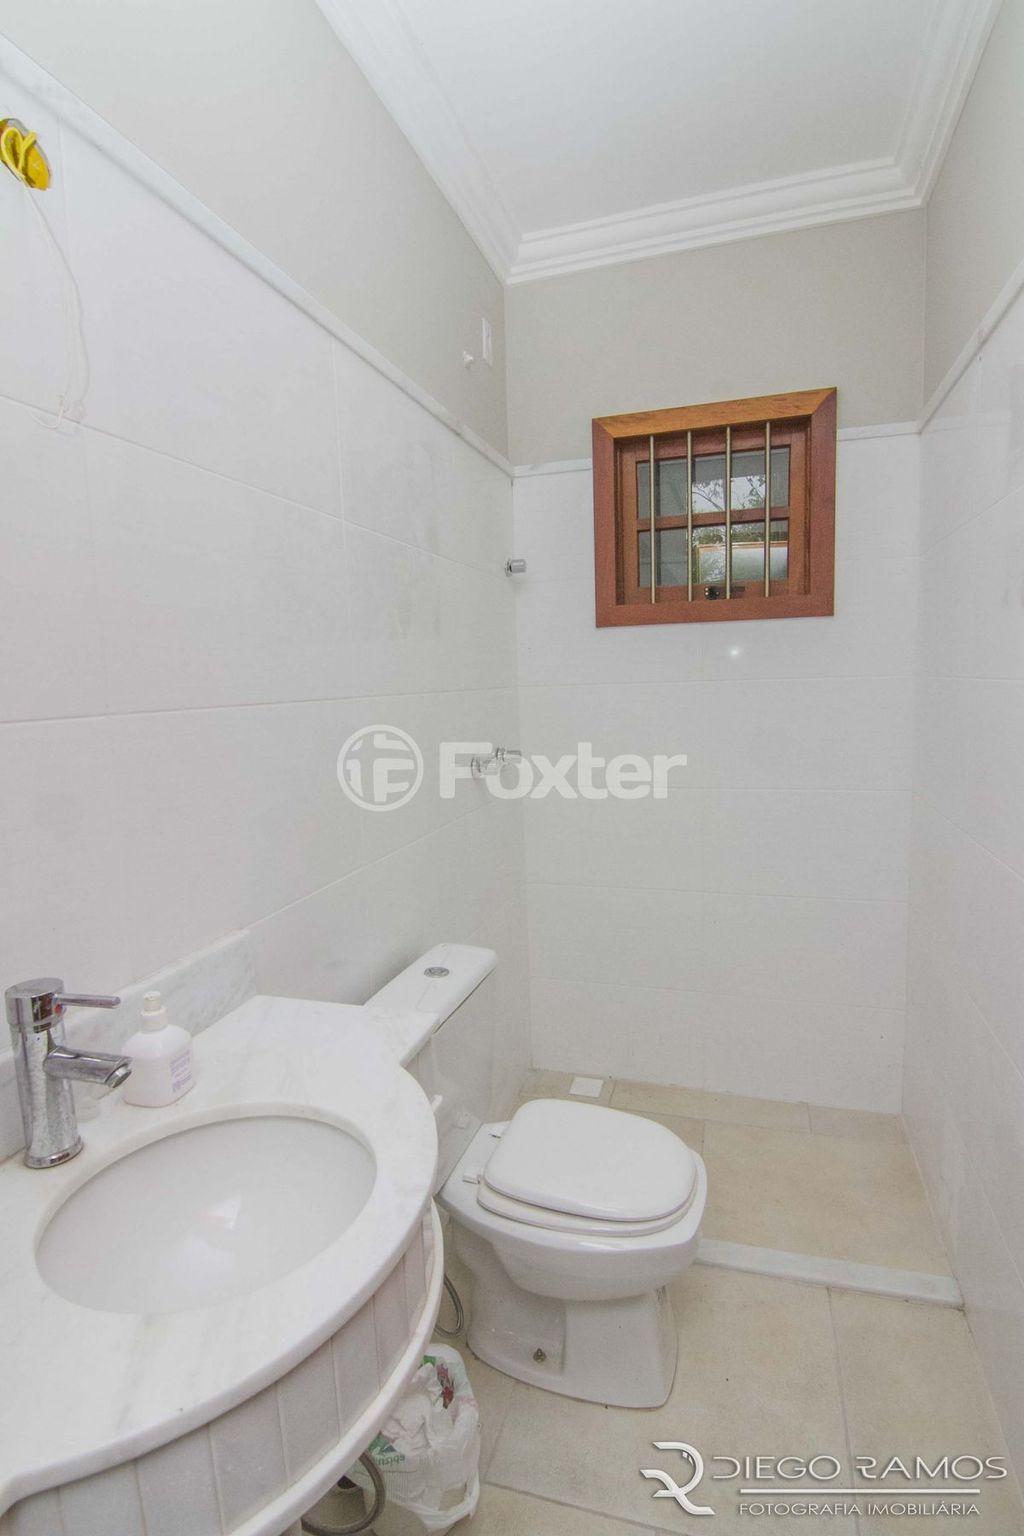 Casa 3 Dorm, Hípica, Porto Alegre (118865) - Foto 13